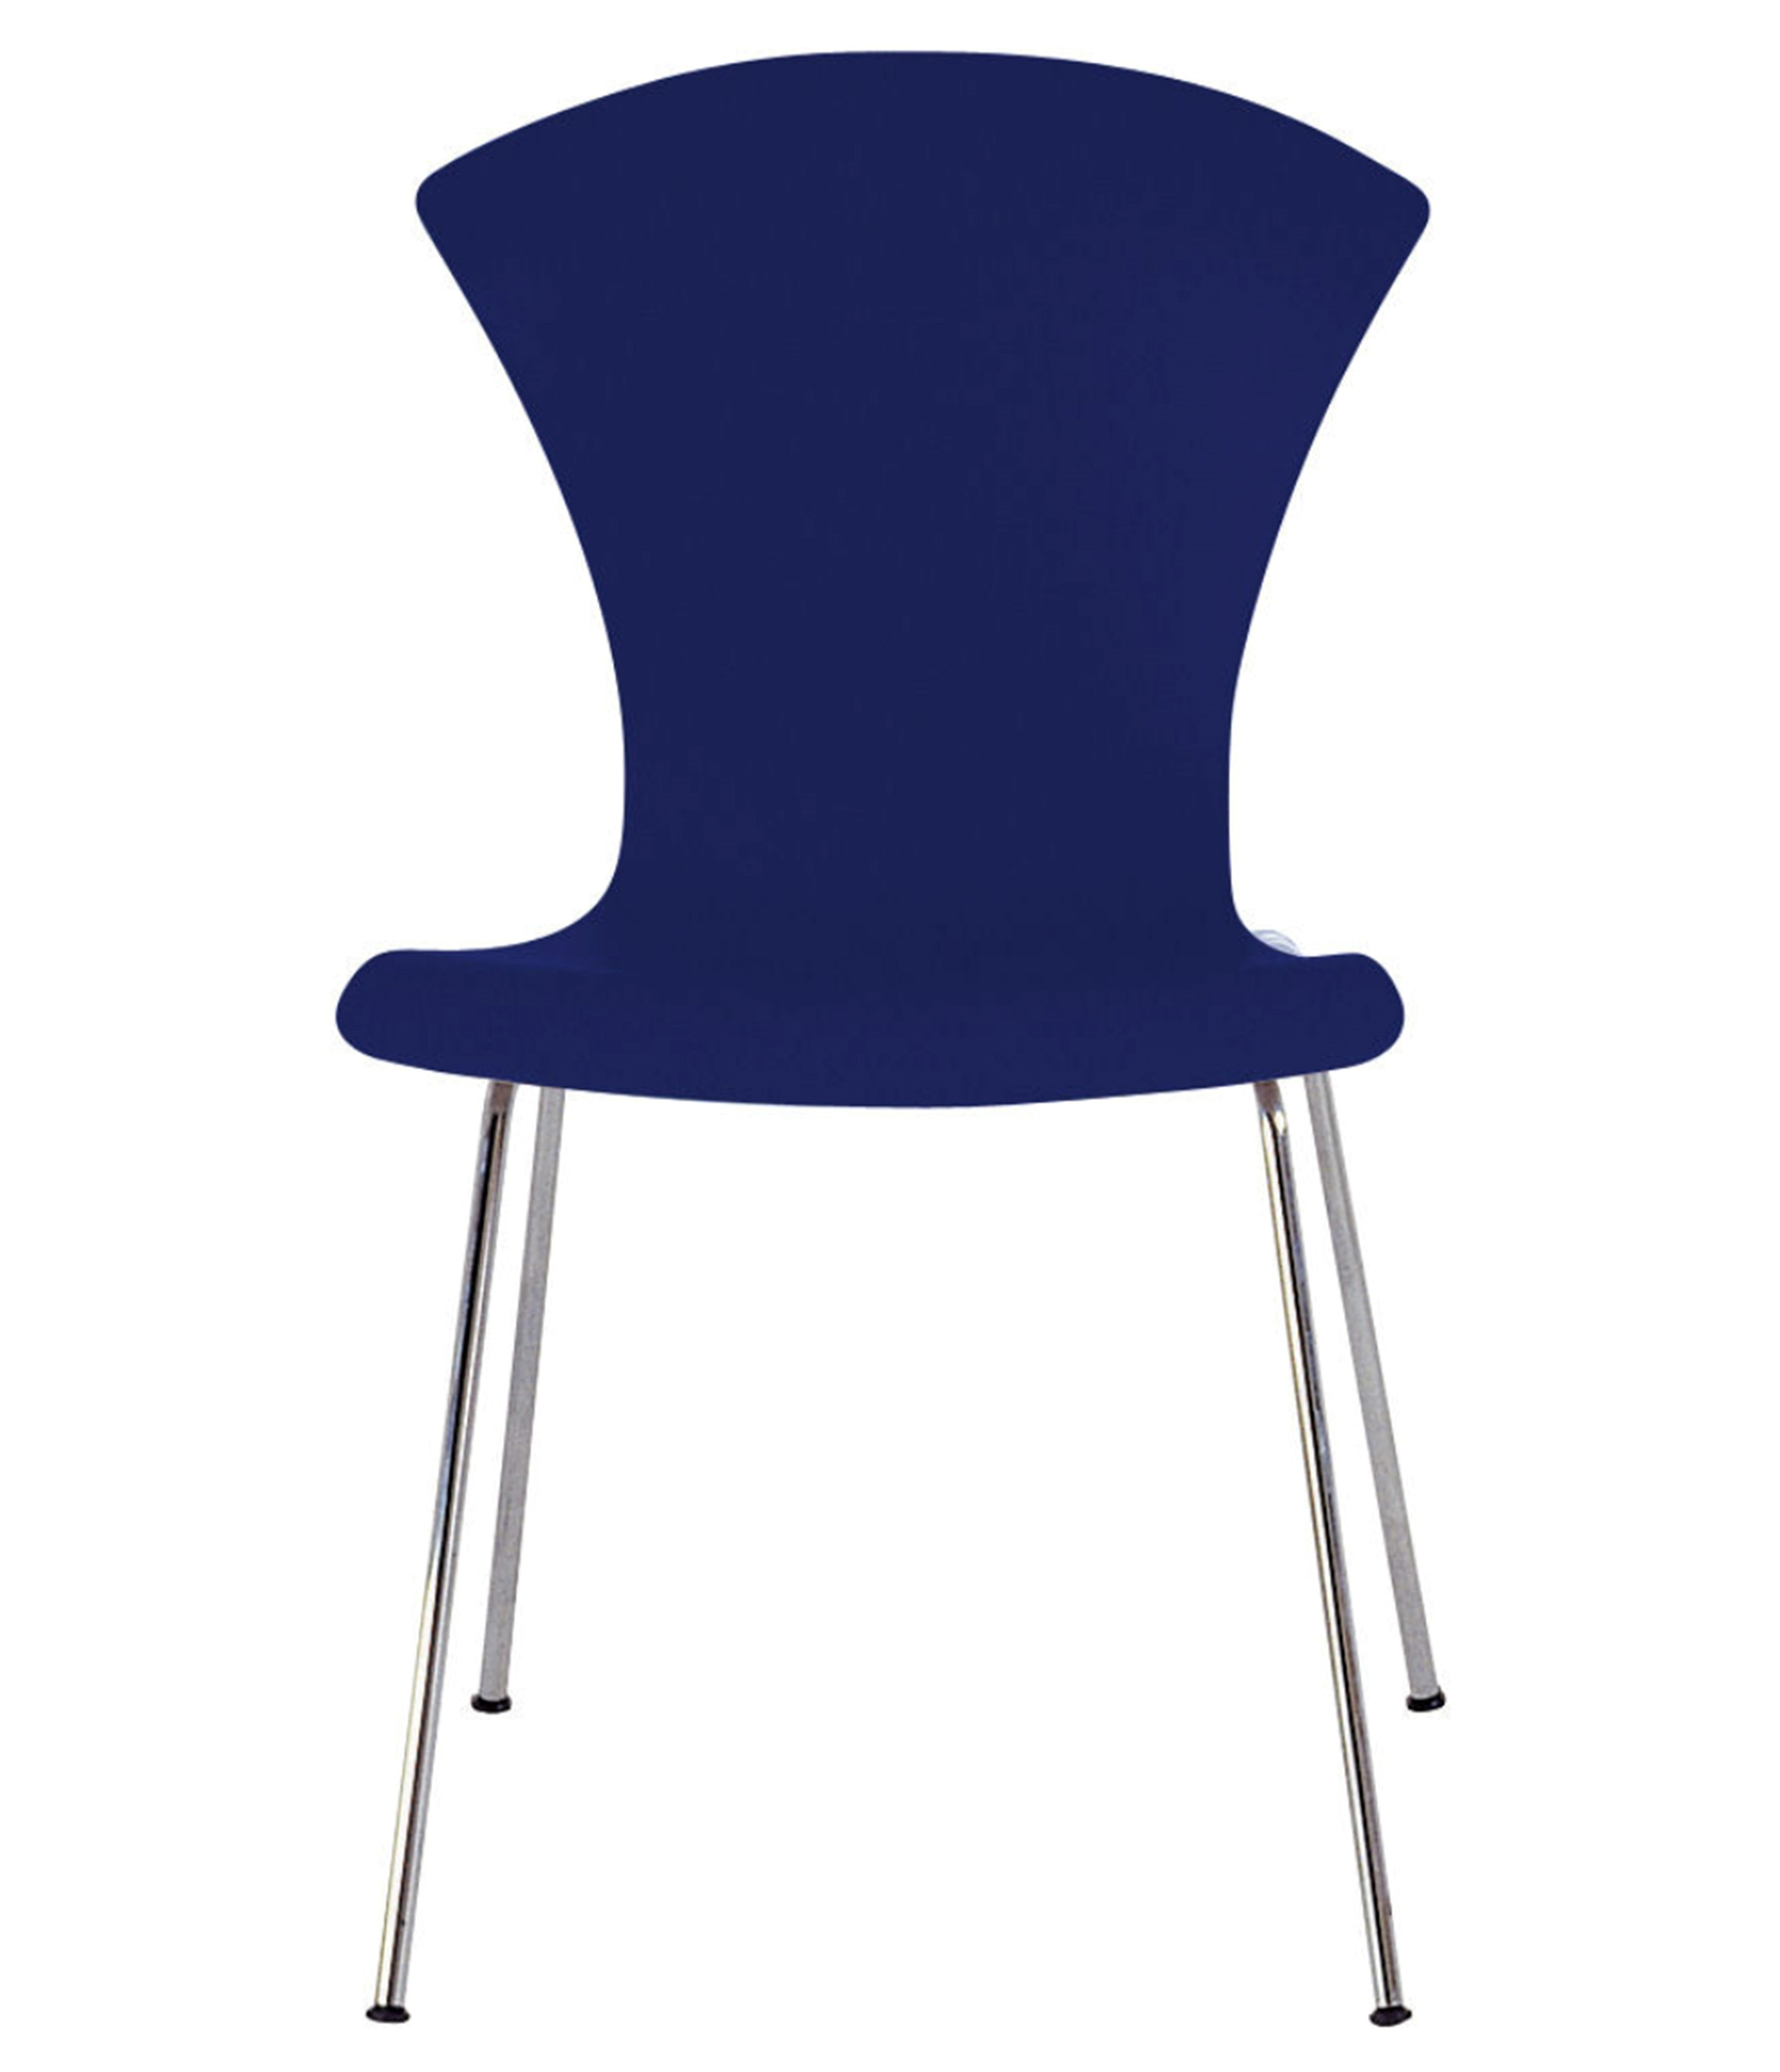 Sedie kartell scontate sedie a prezzi scontati for Sedie kartell prezzi